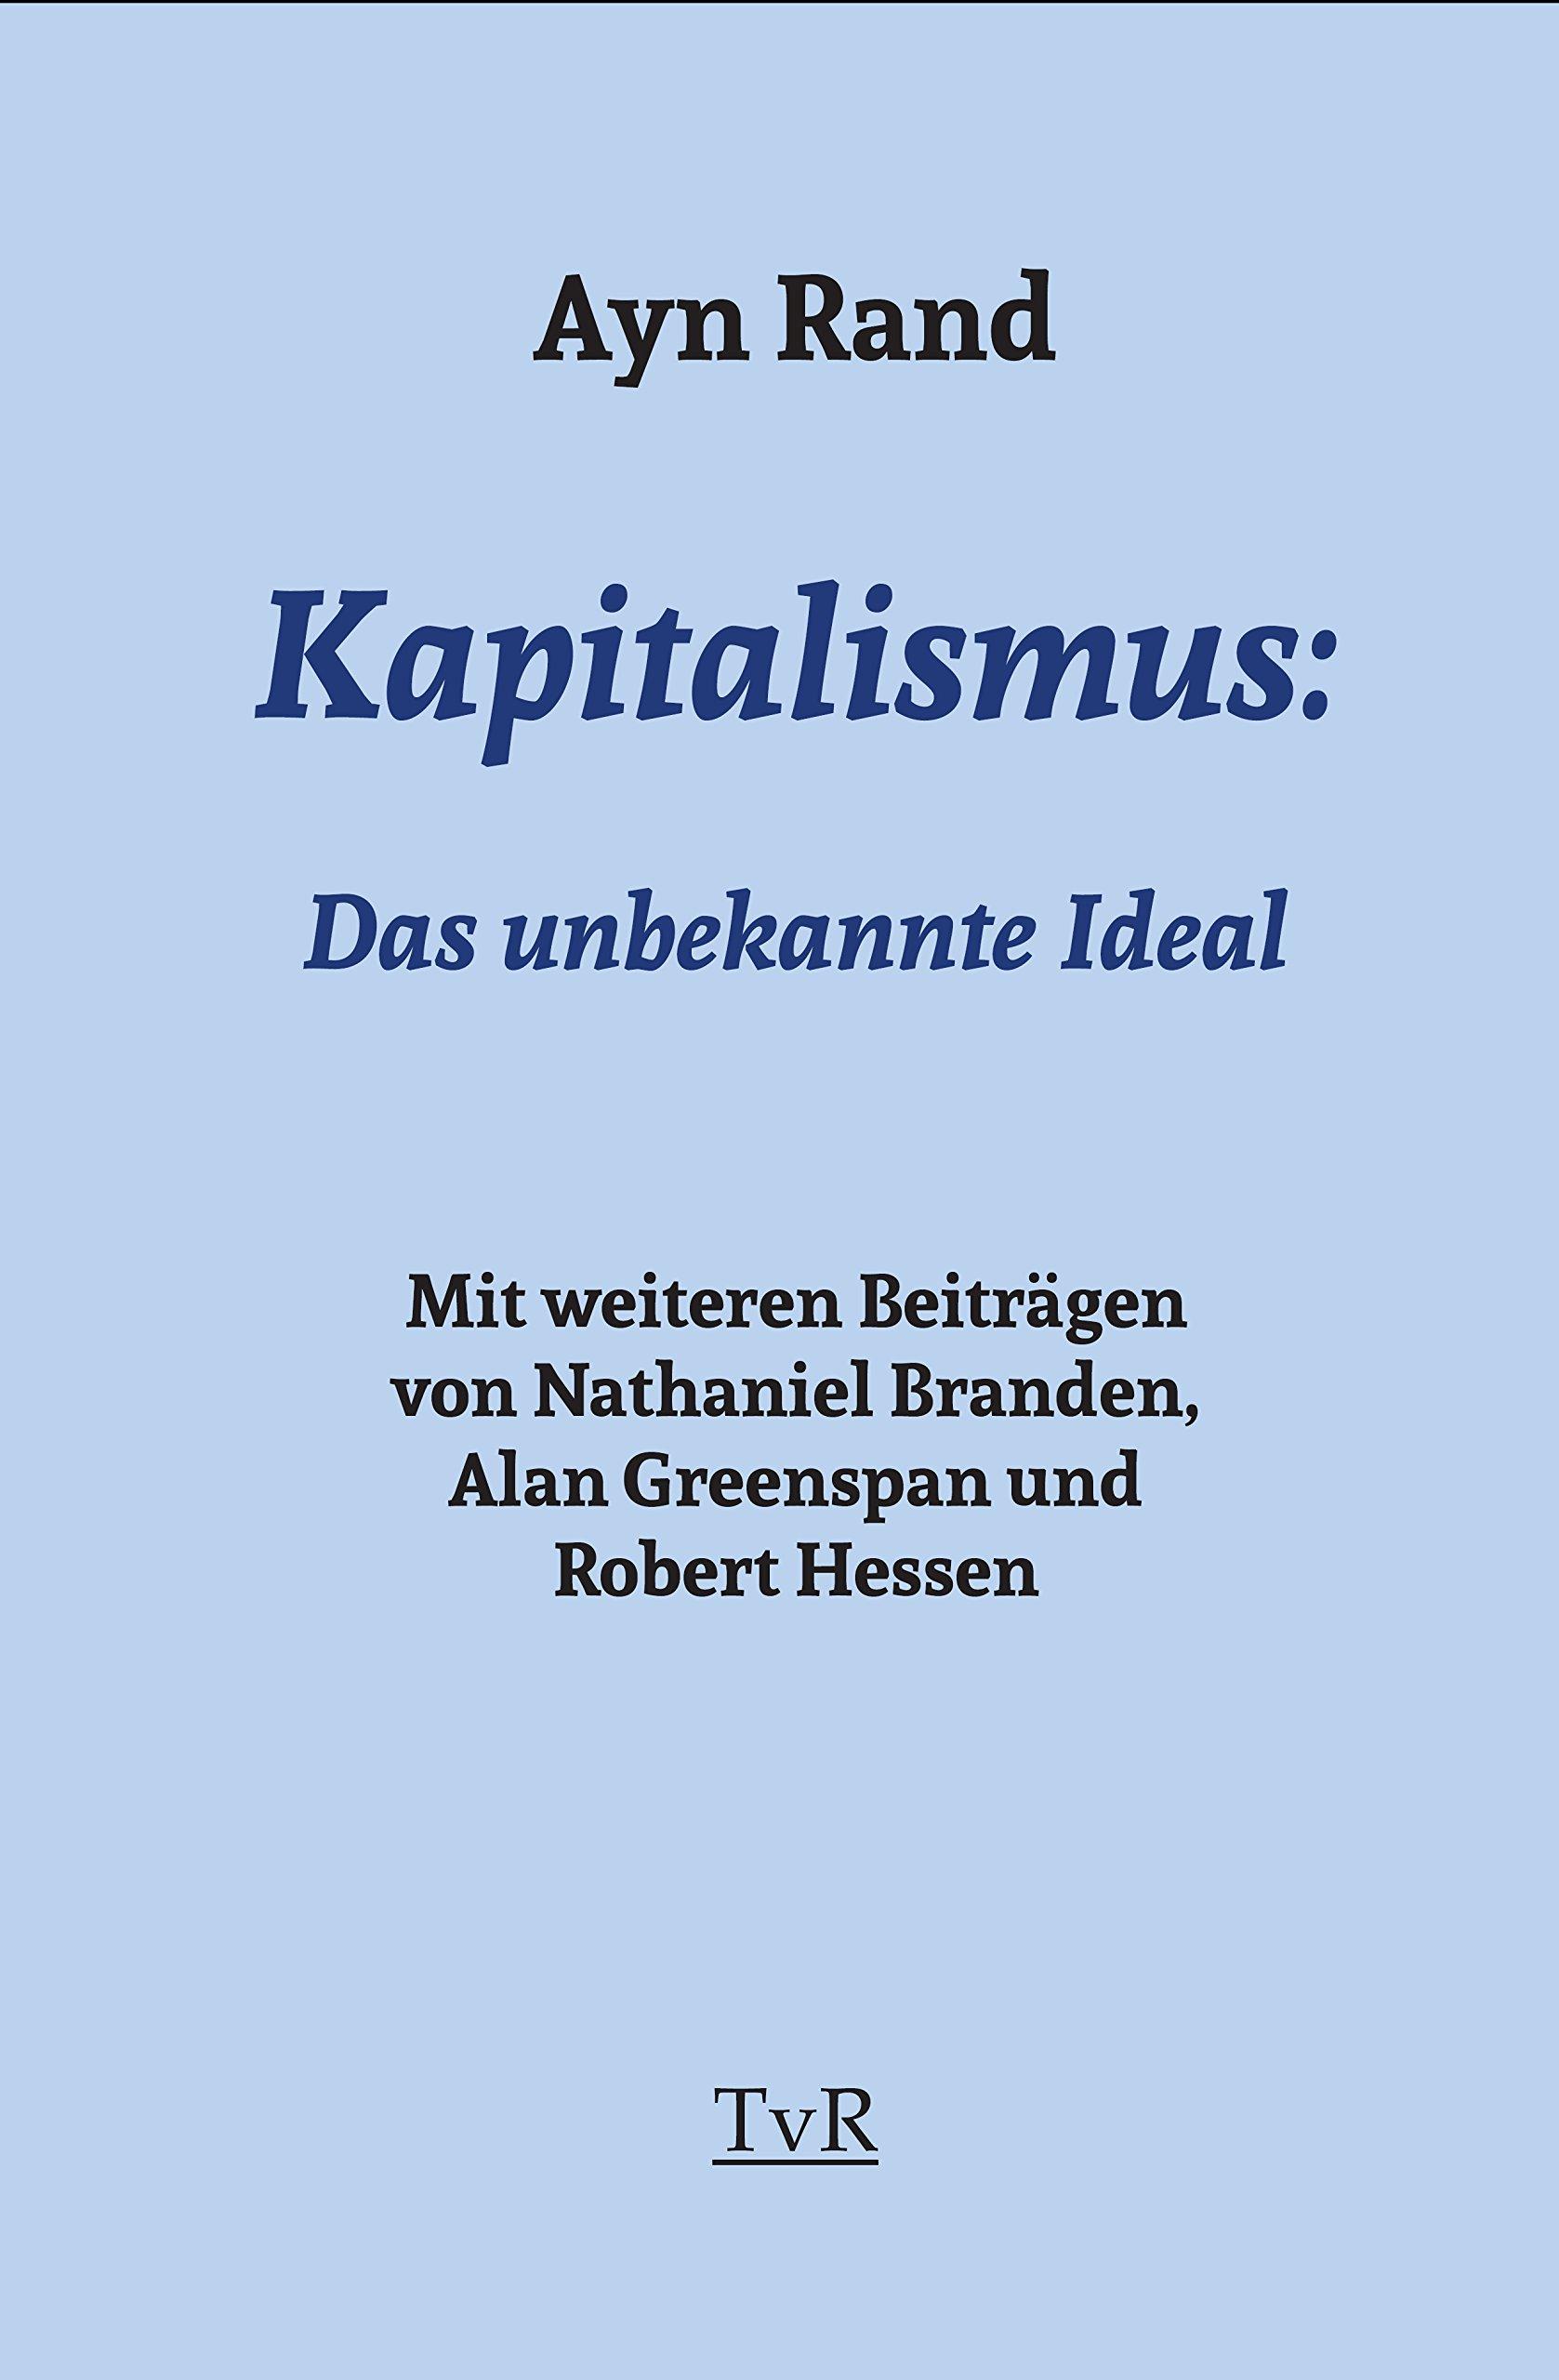 Kapitalismus: Das unbekannte Ideal: Amazon.de: Ayn Rand, Nathaniel Branden,  Alan Greenspan, Robert Hessen, Philipp Dammer: Bücher